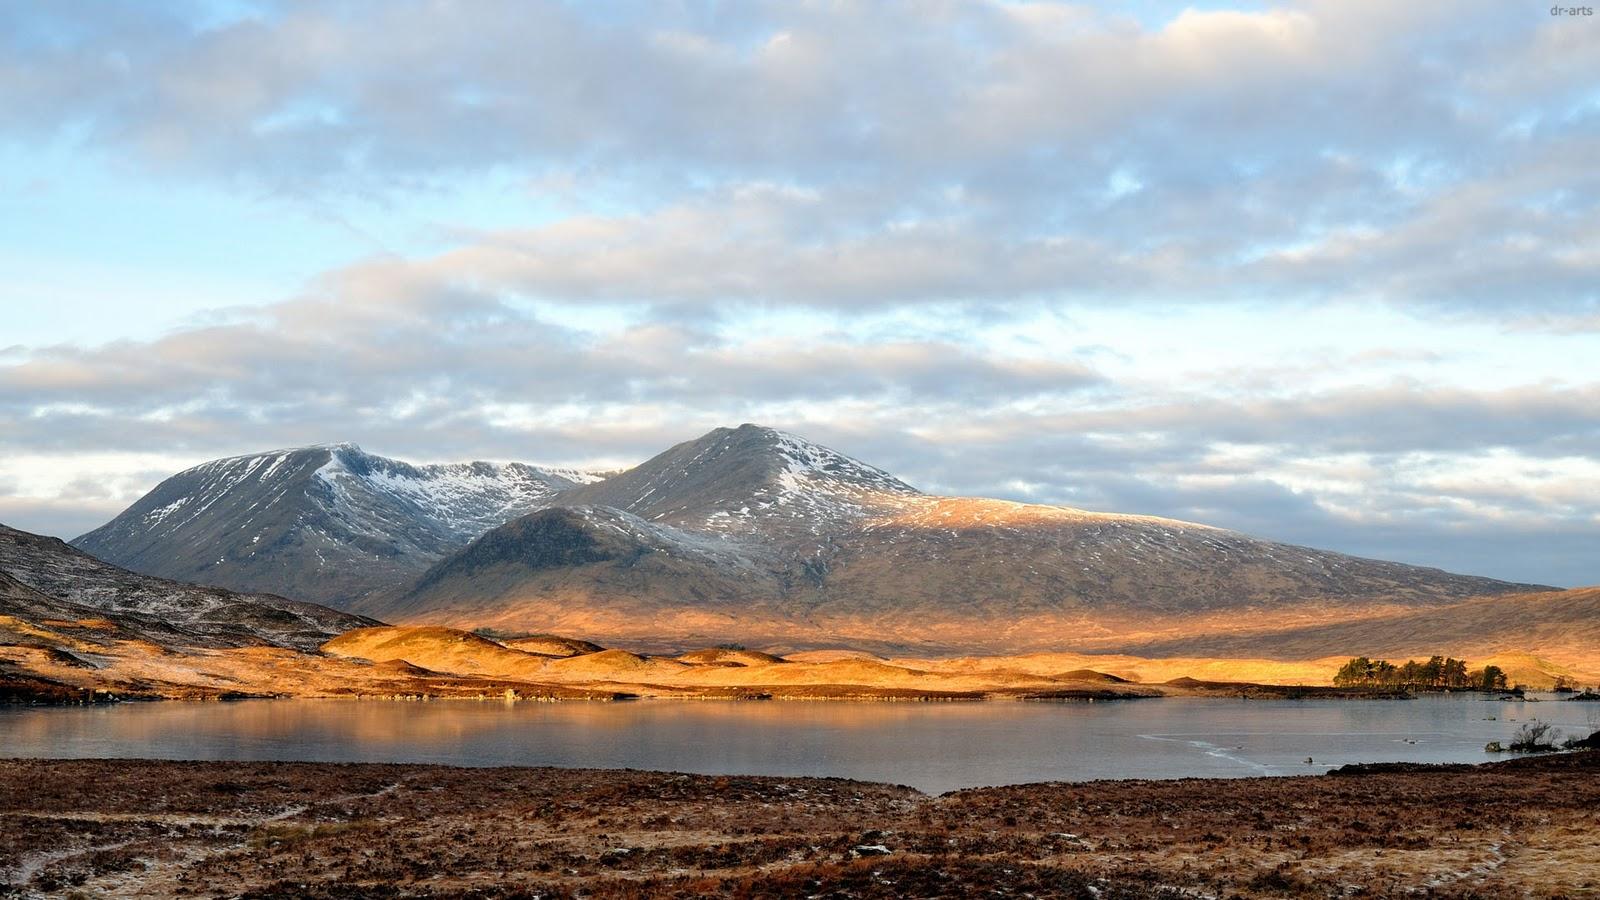 http://3.bp.blogspot.com/_-wodyymBlIY/TP-USEZHLwI/AAAAAAAAIds/Q33GXgZ6f9Y/s1600/paisagem+lago+montanhas.jpg